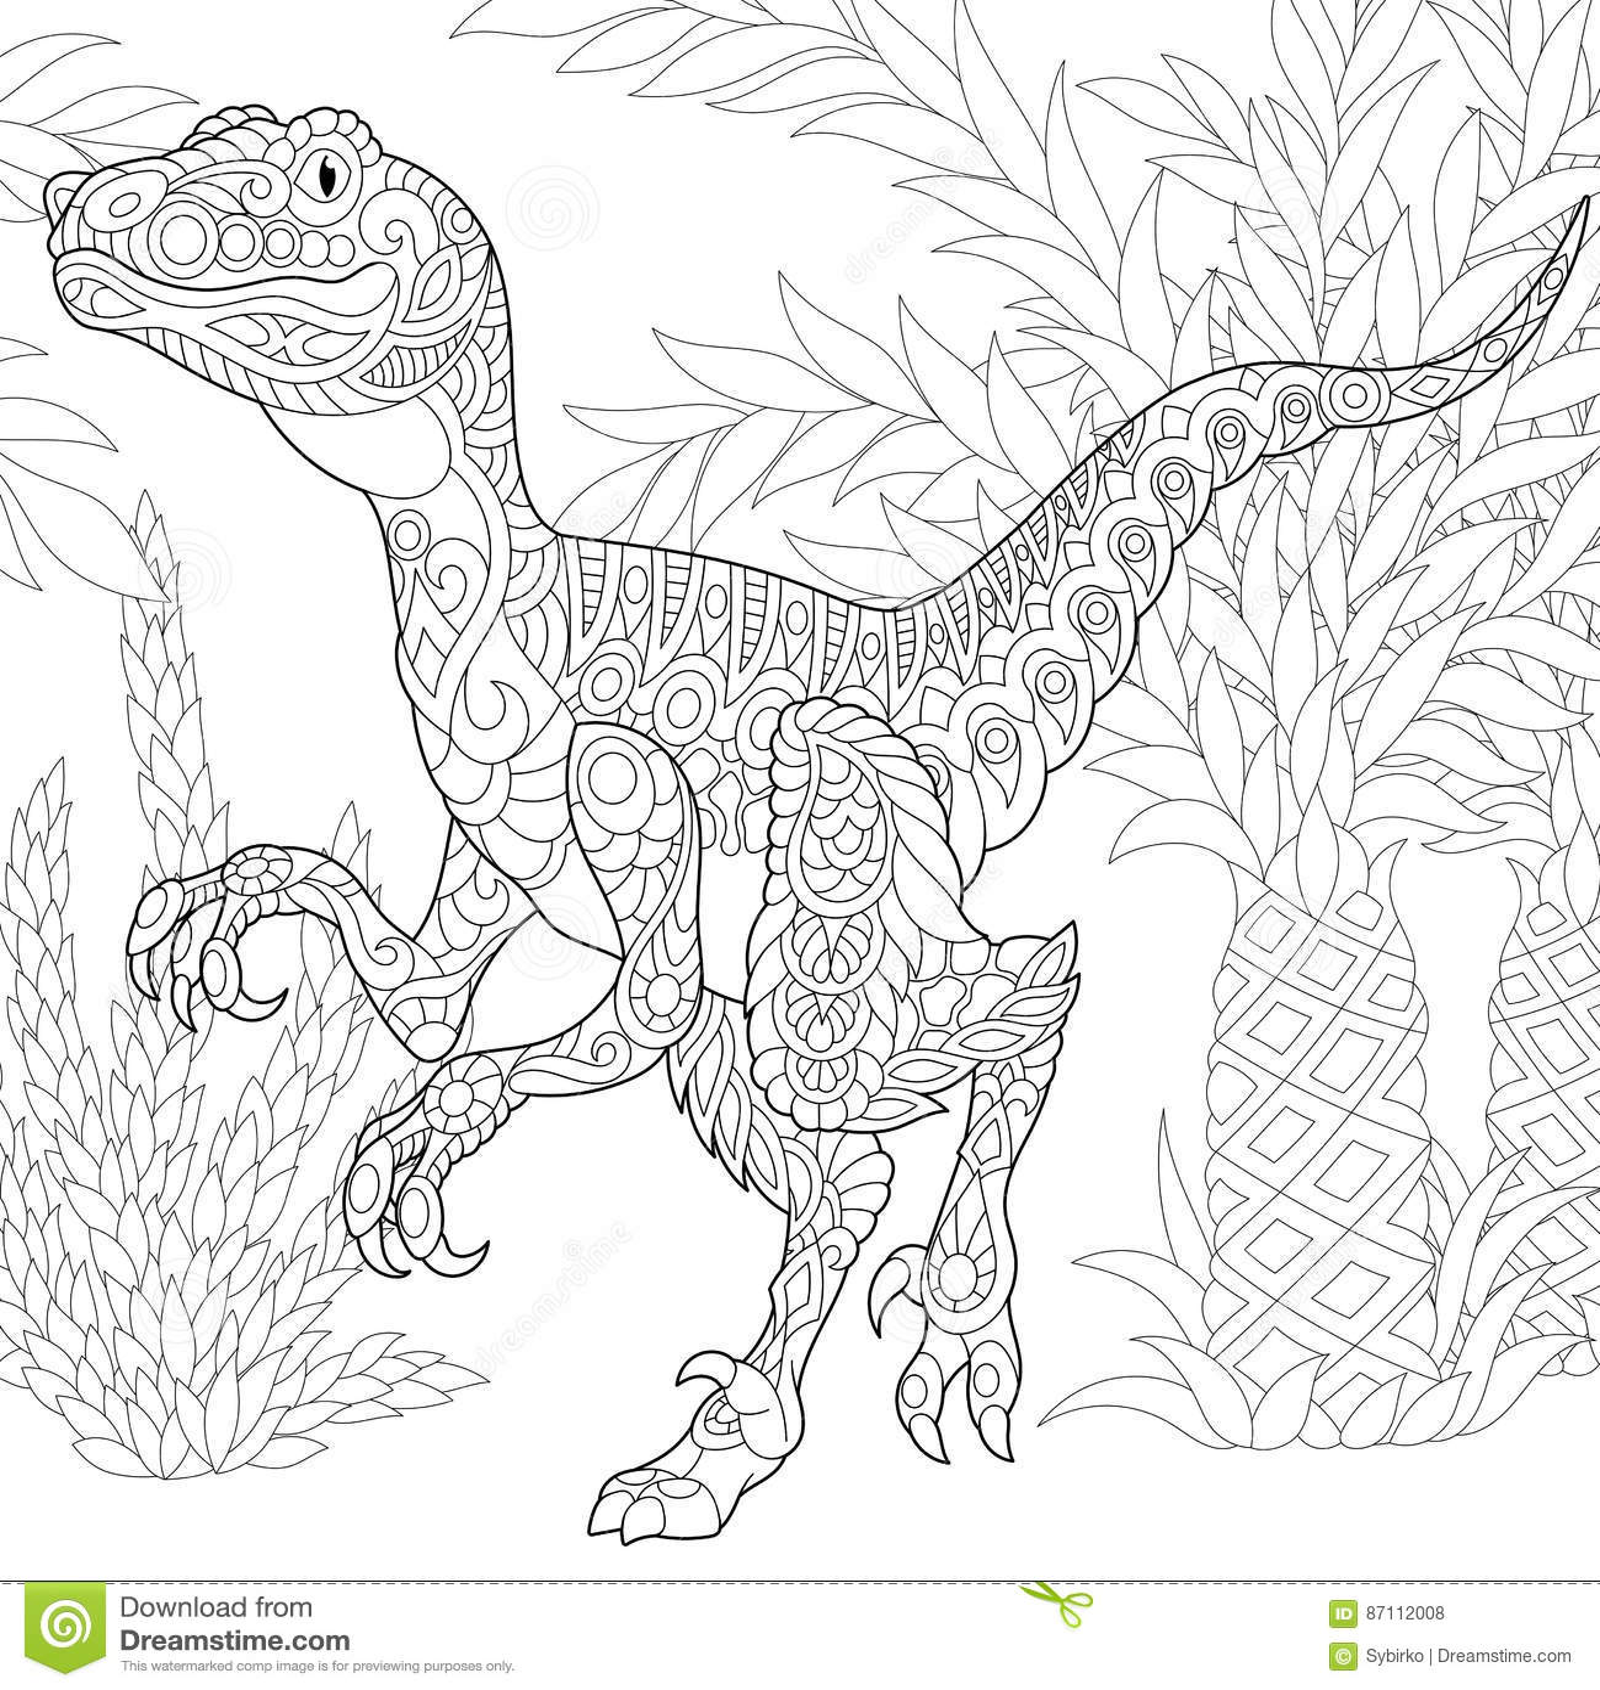 Coloriage Dinosaure Fossiles.Dinosaure De Velociraptor De Zentangle Illustration De Vecteur